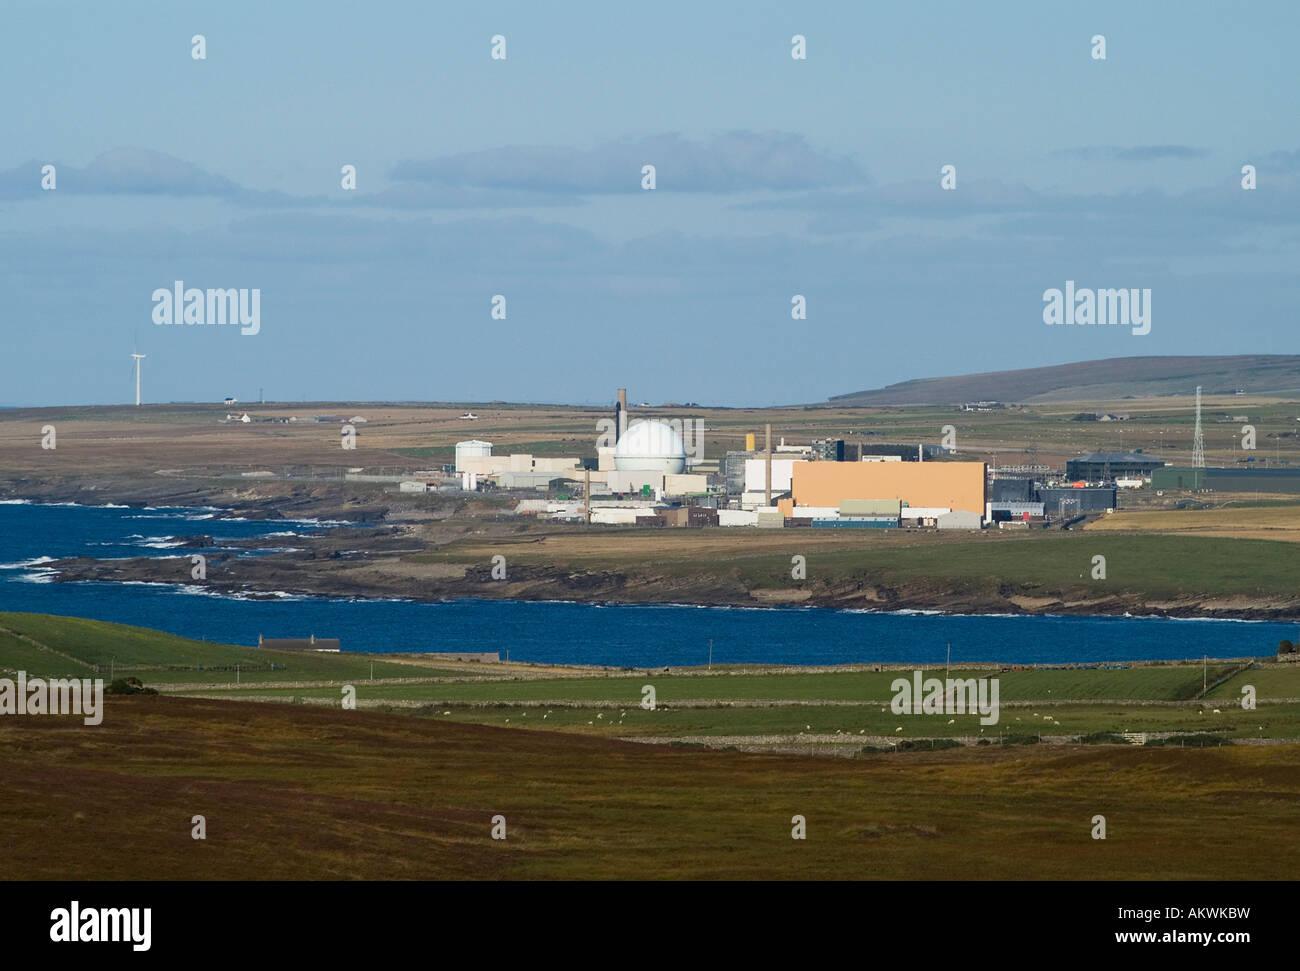 dh  DOUNREAY CAITHNESS Uk Nuclear atomic reactor electricity power station near Thurso scotland - Stock Image